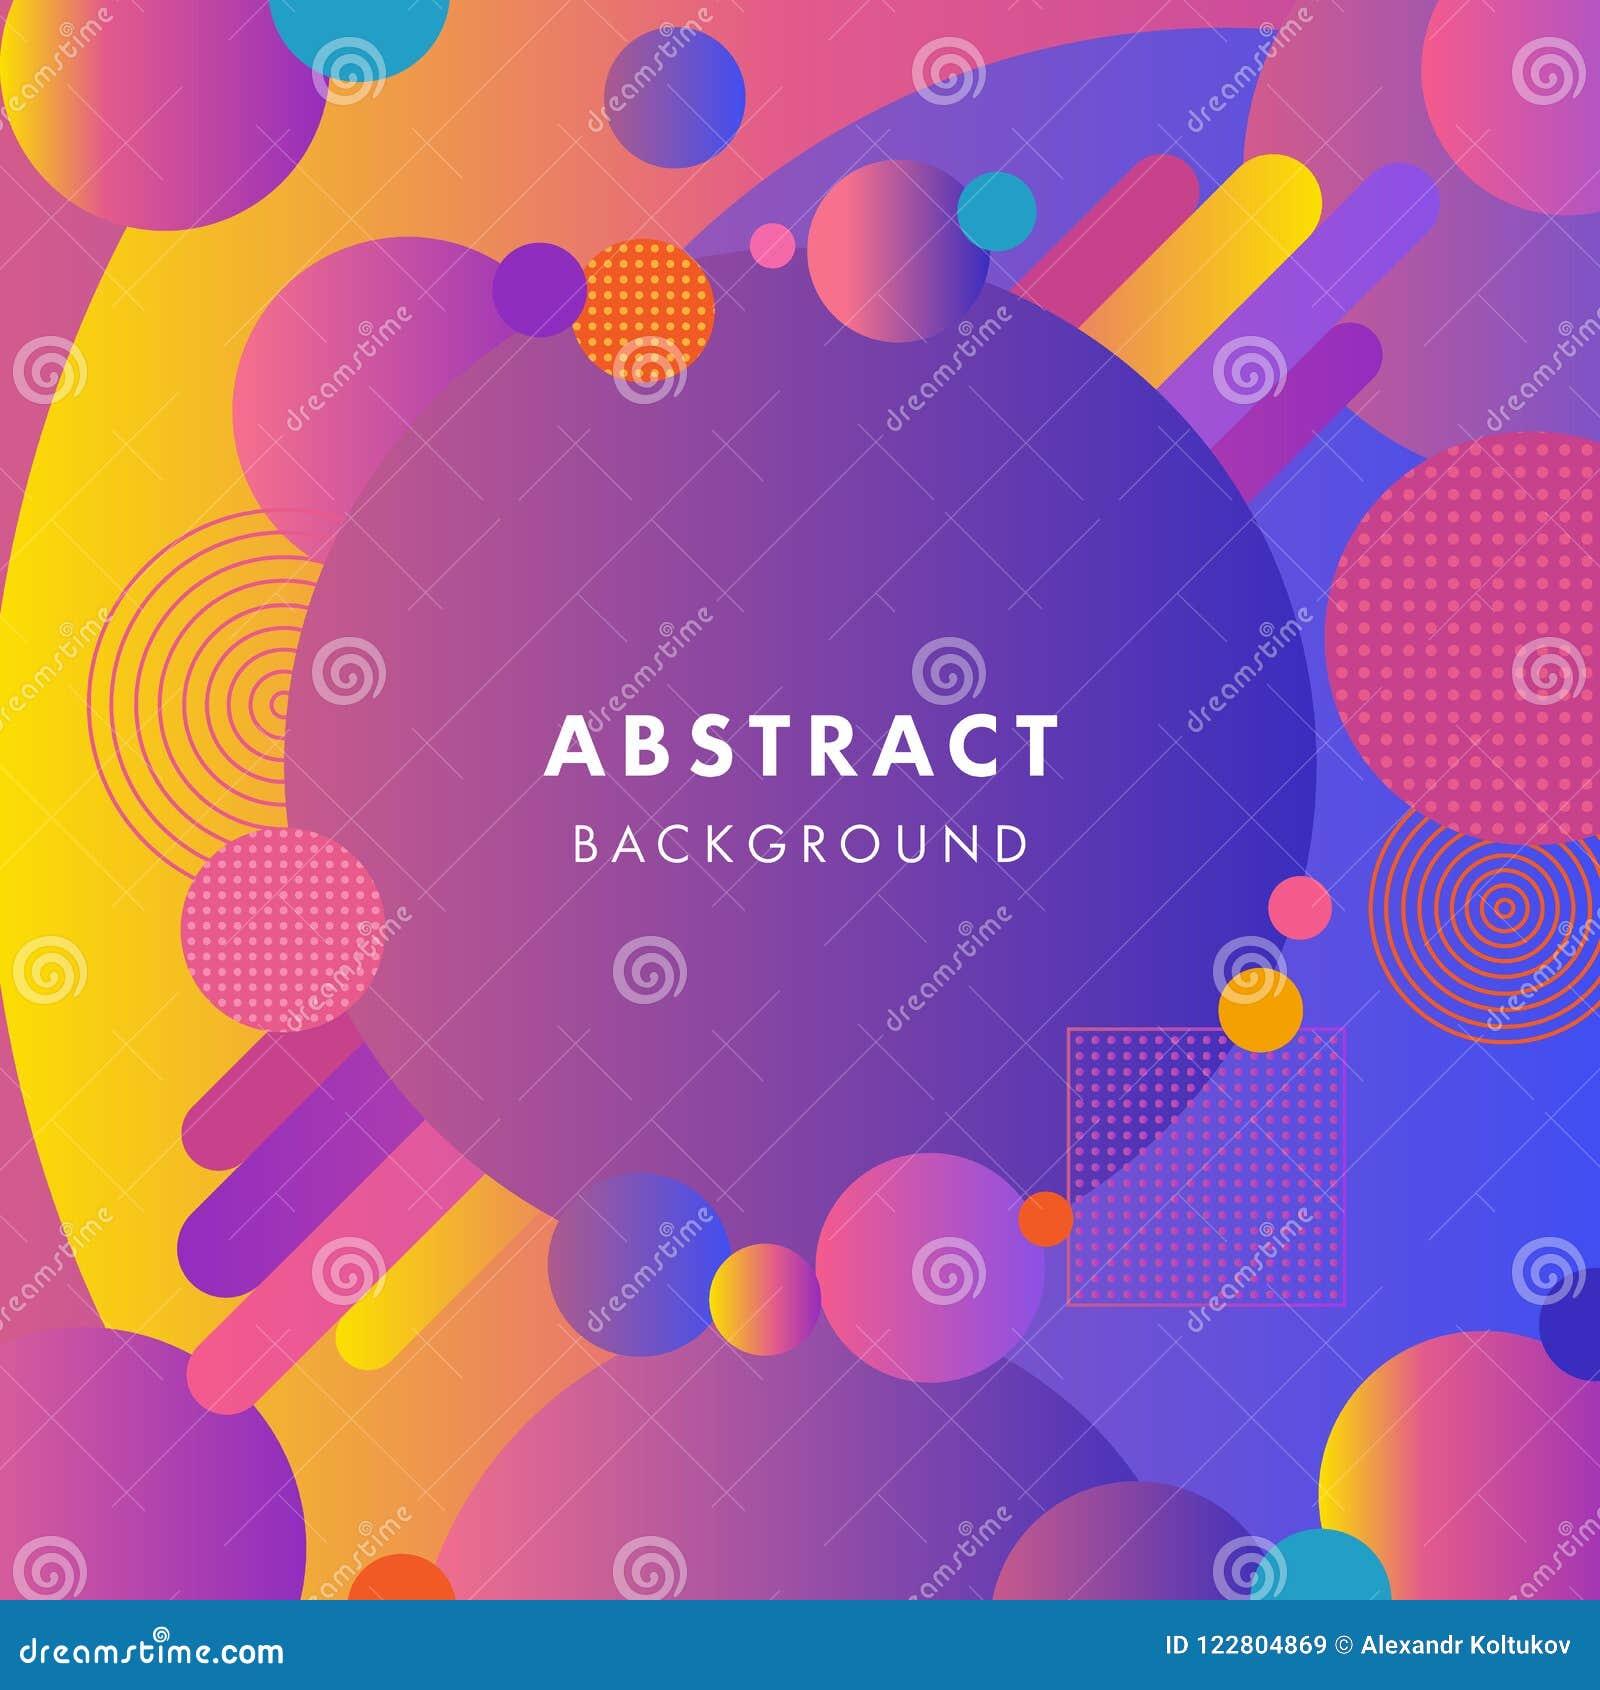 elegant background with flat dynamic ultra violet bubbles design